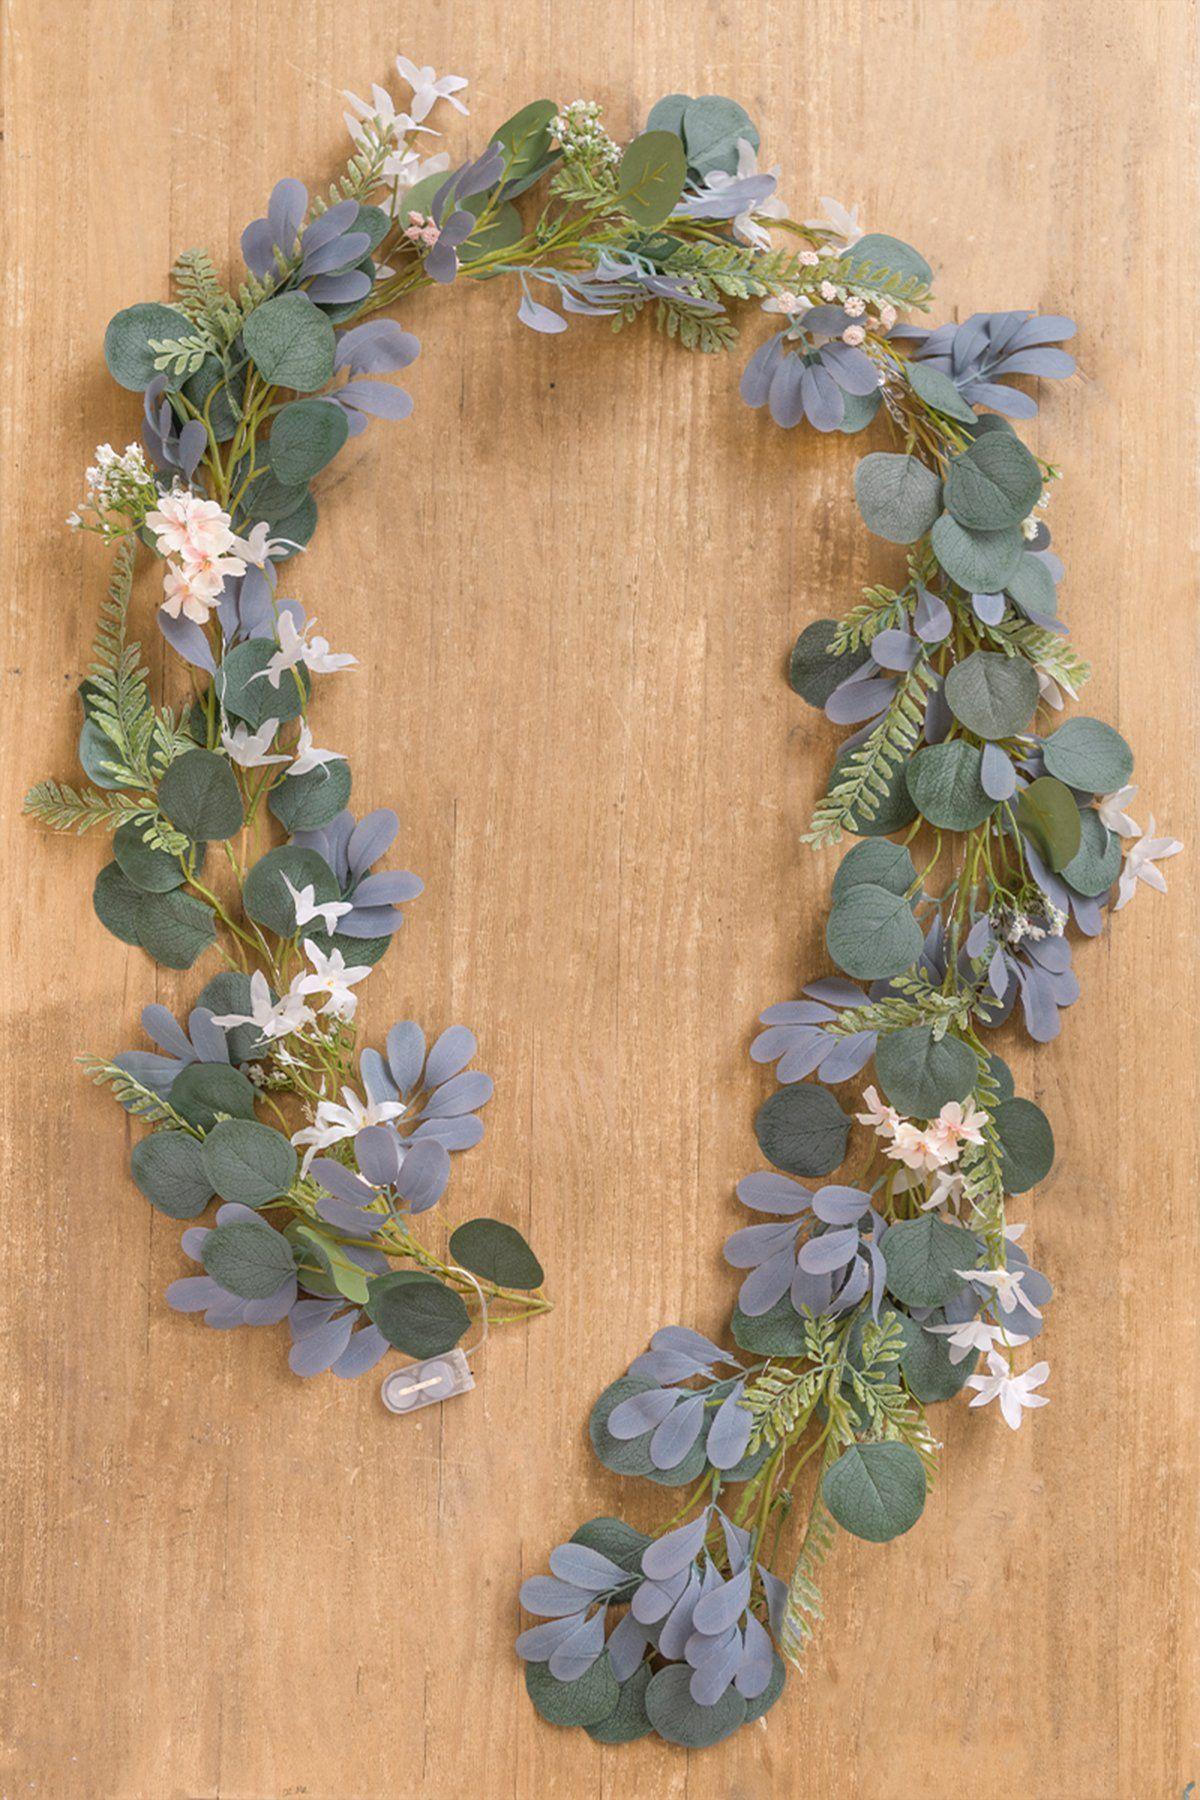 Garlands and Vines (15 Types) in 2020 Wedding arch, Garland